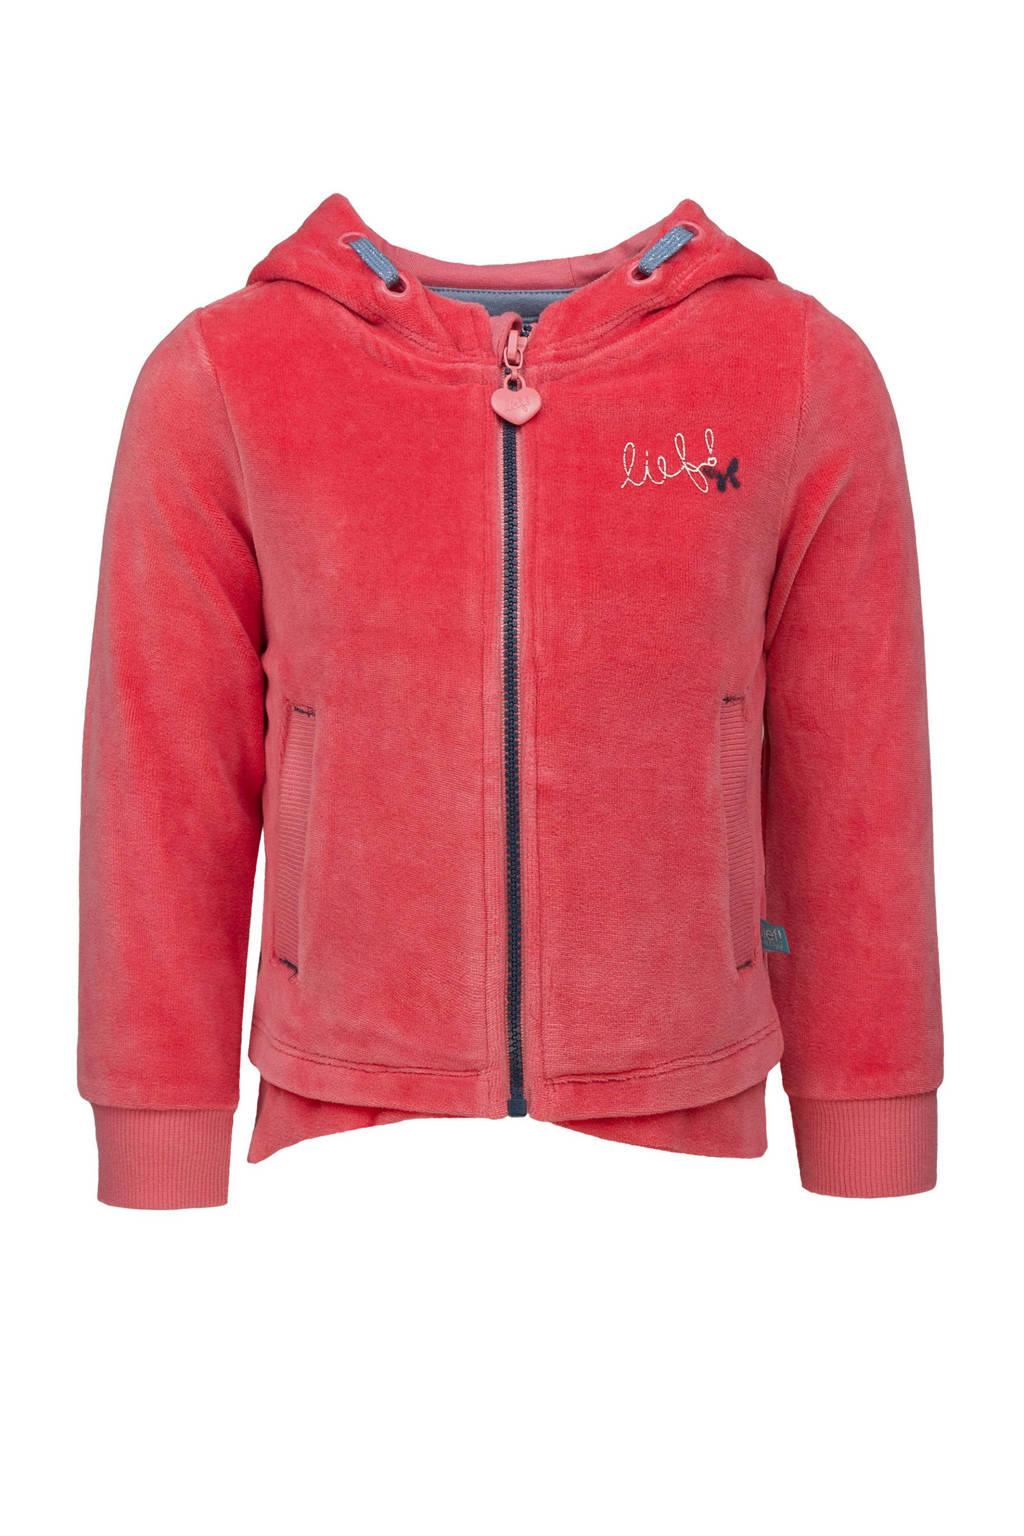 lief! badstof vest met logo en borduursels roze, Roze